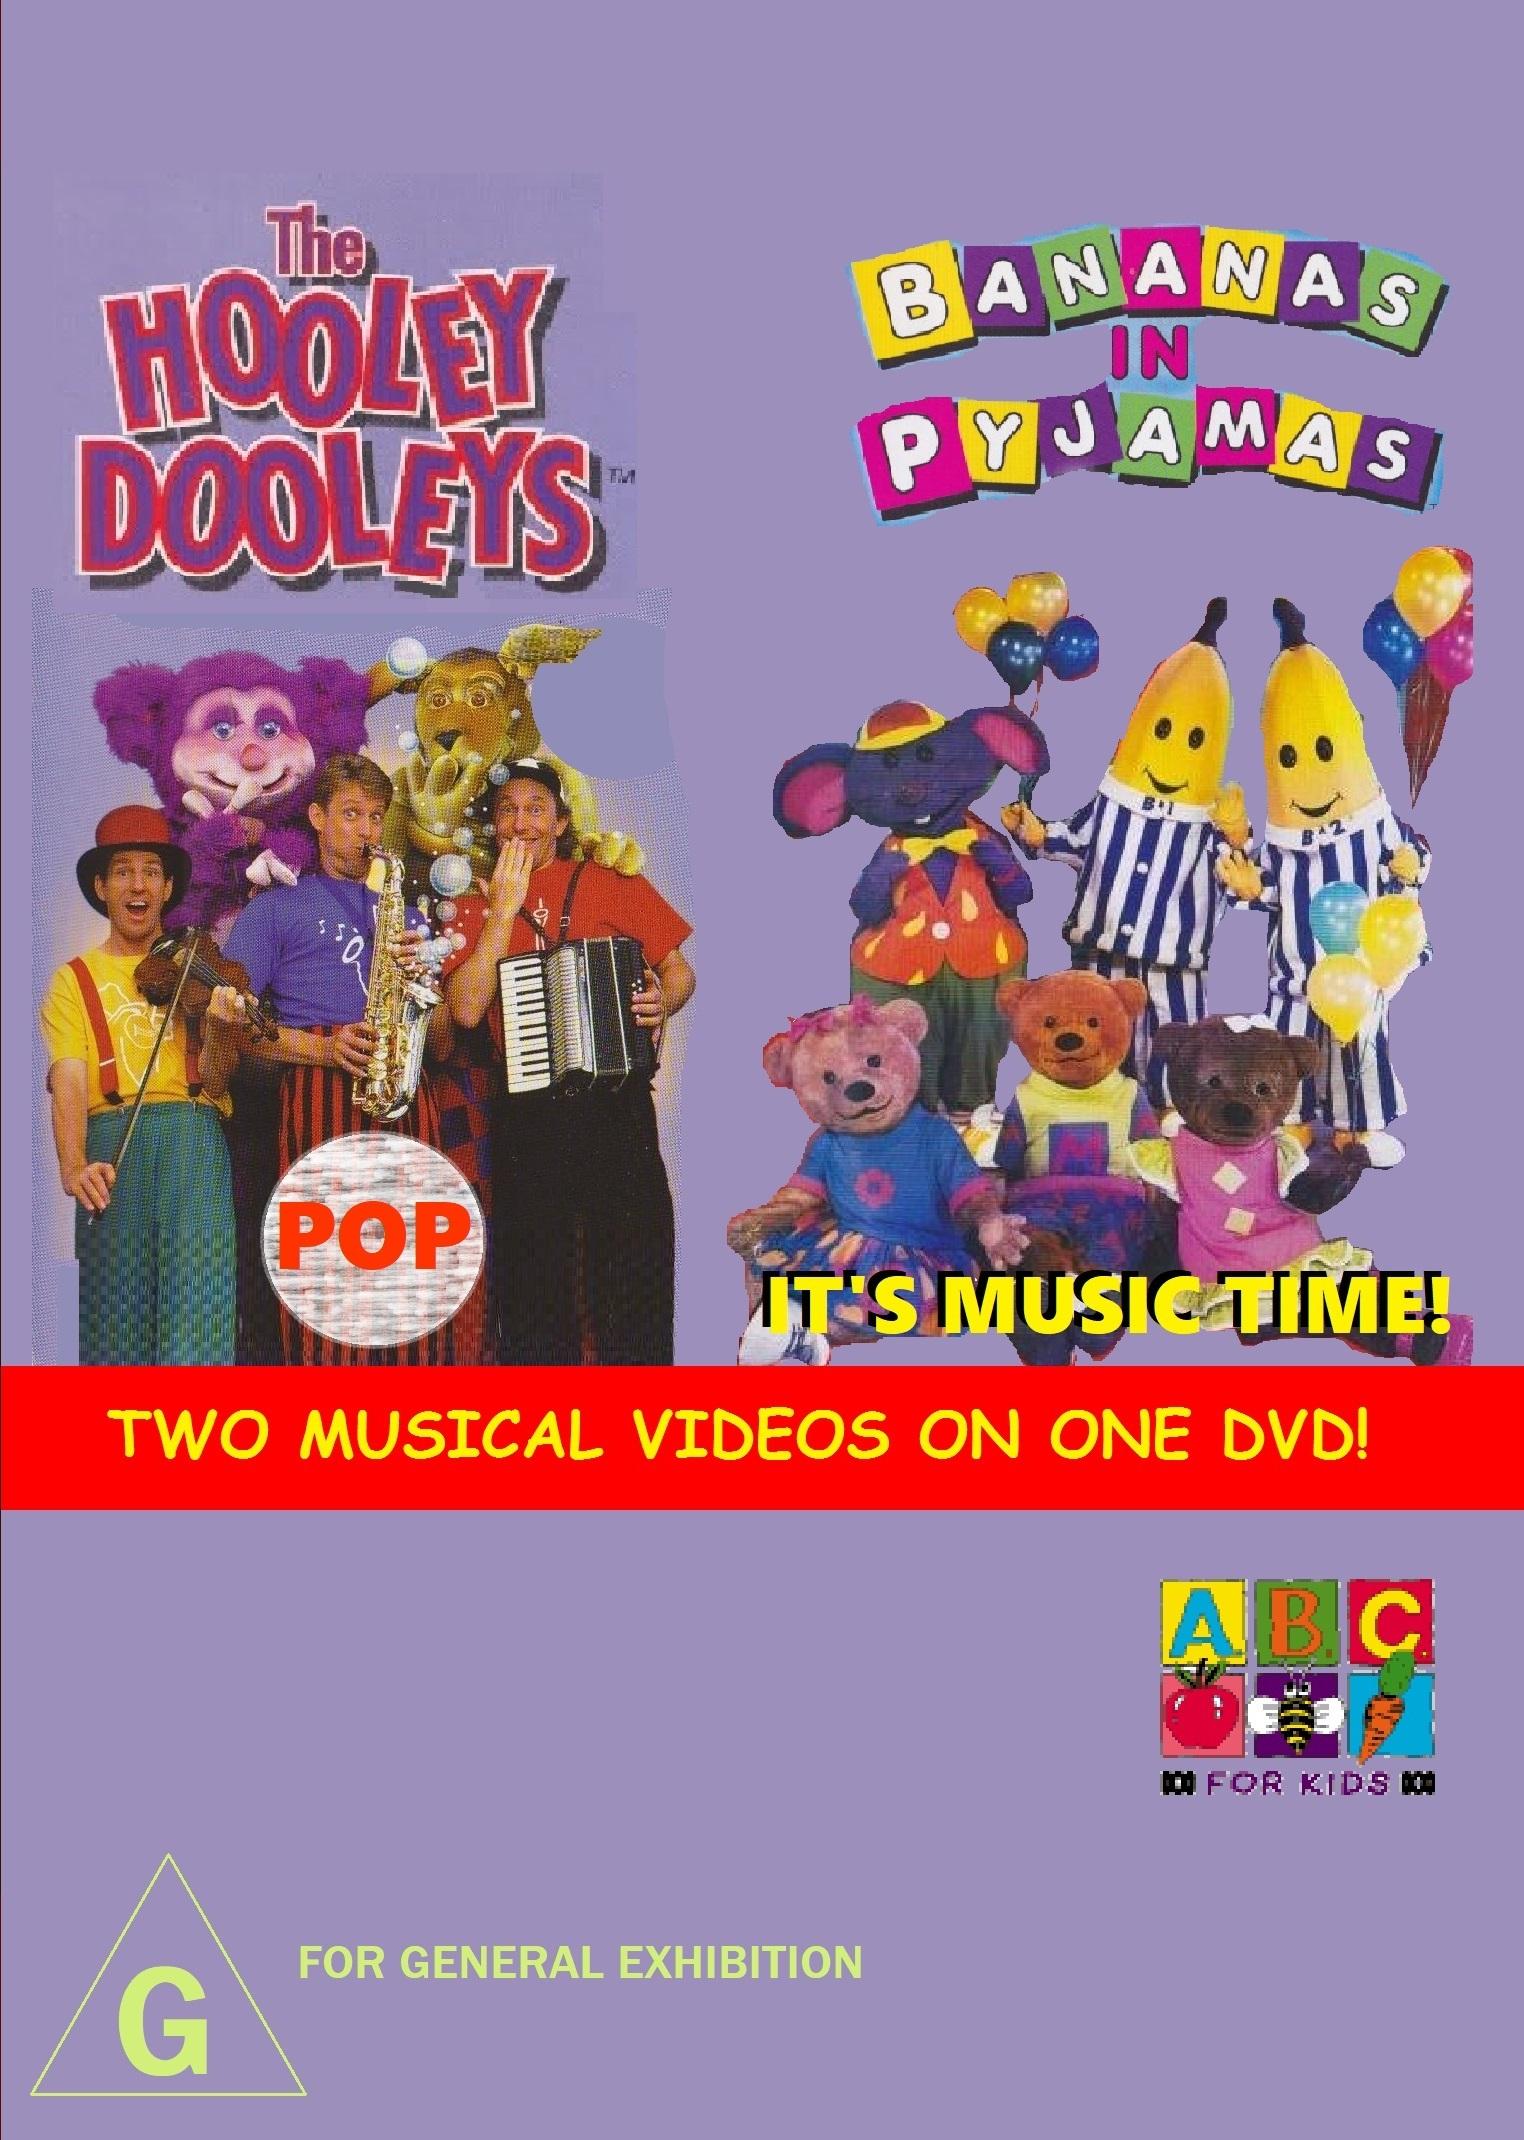 Pop! + It's Music Time